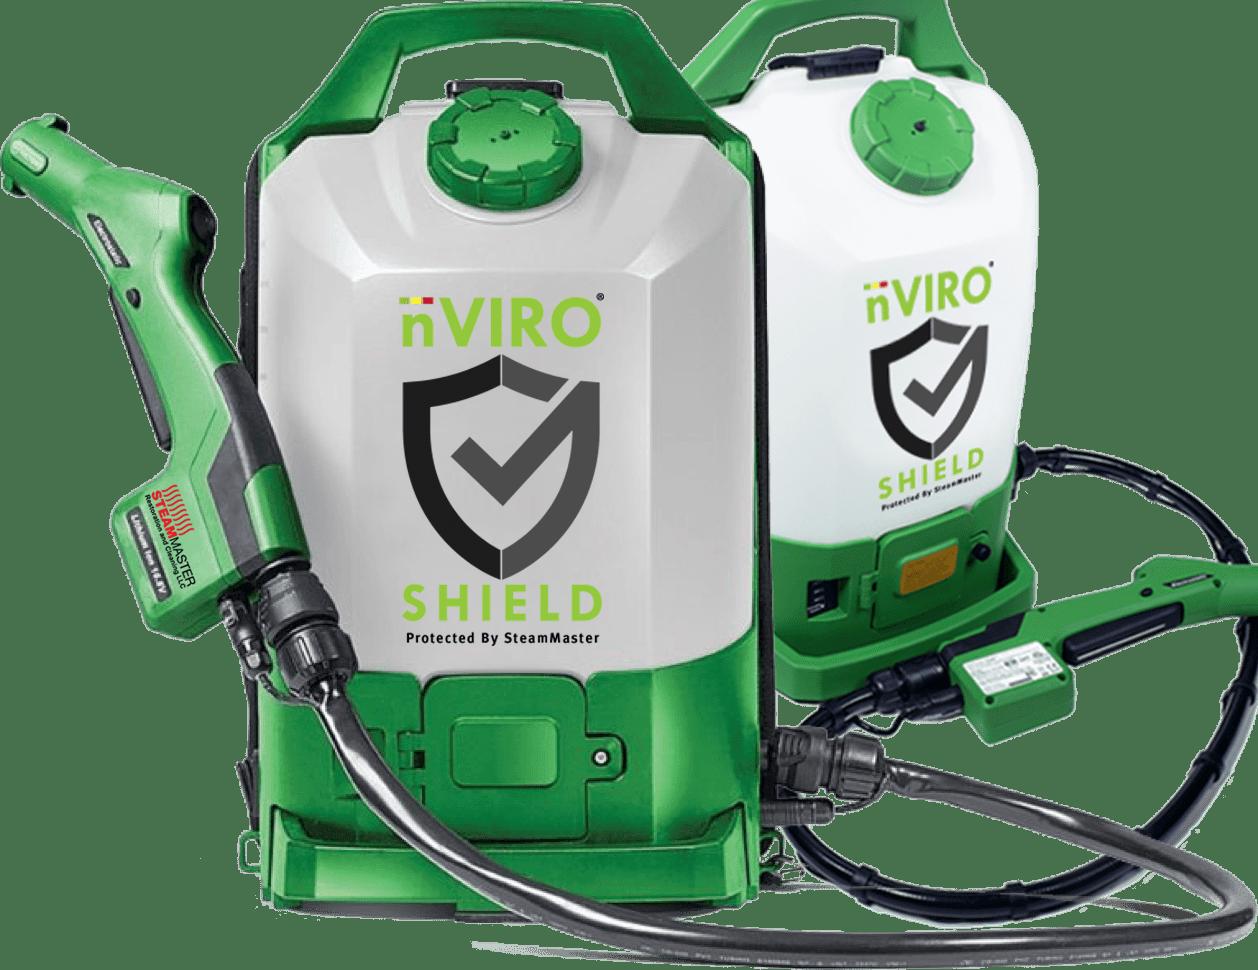 nVIRO Shield Pathogen Control System